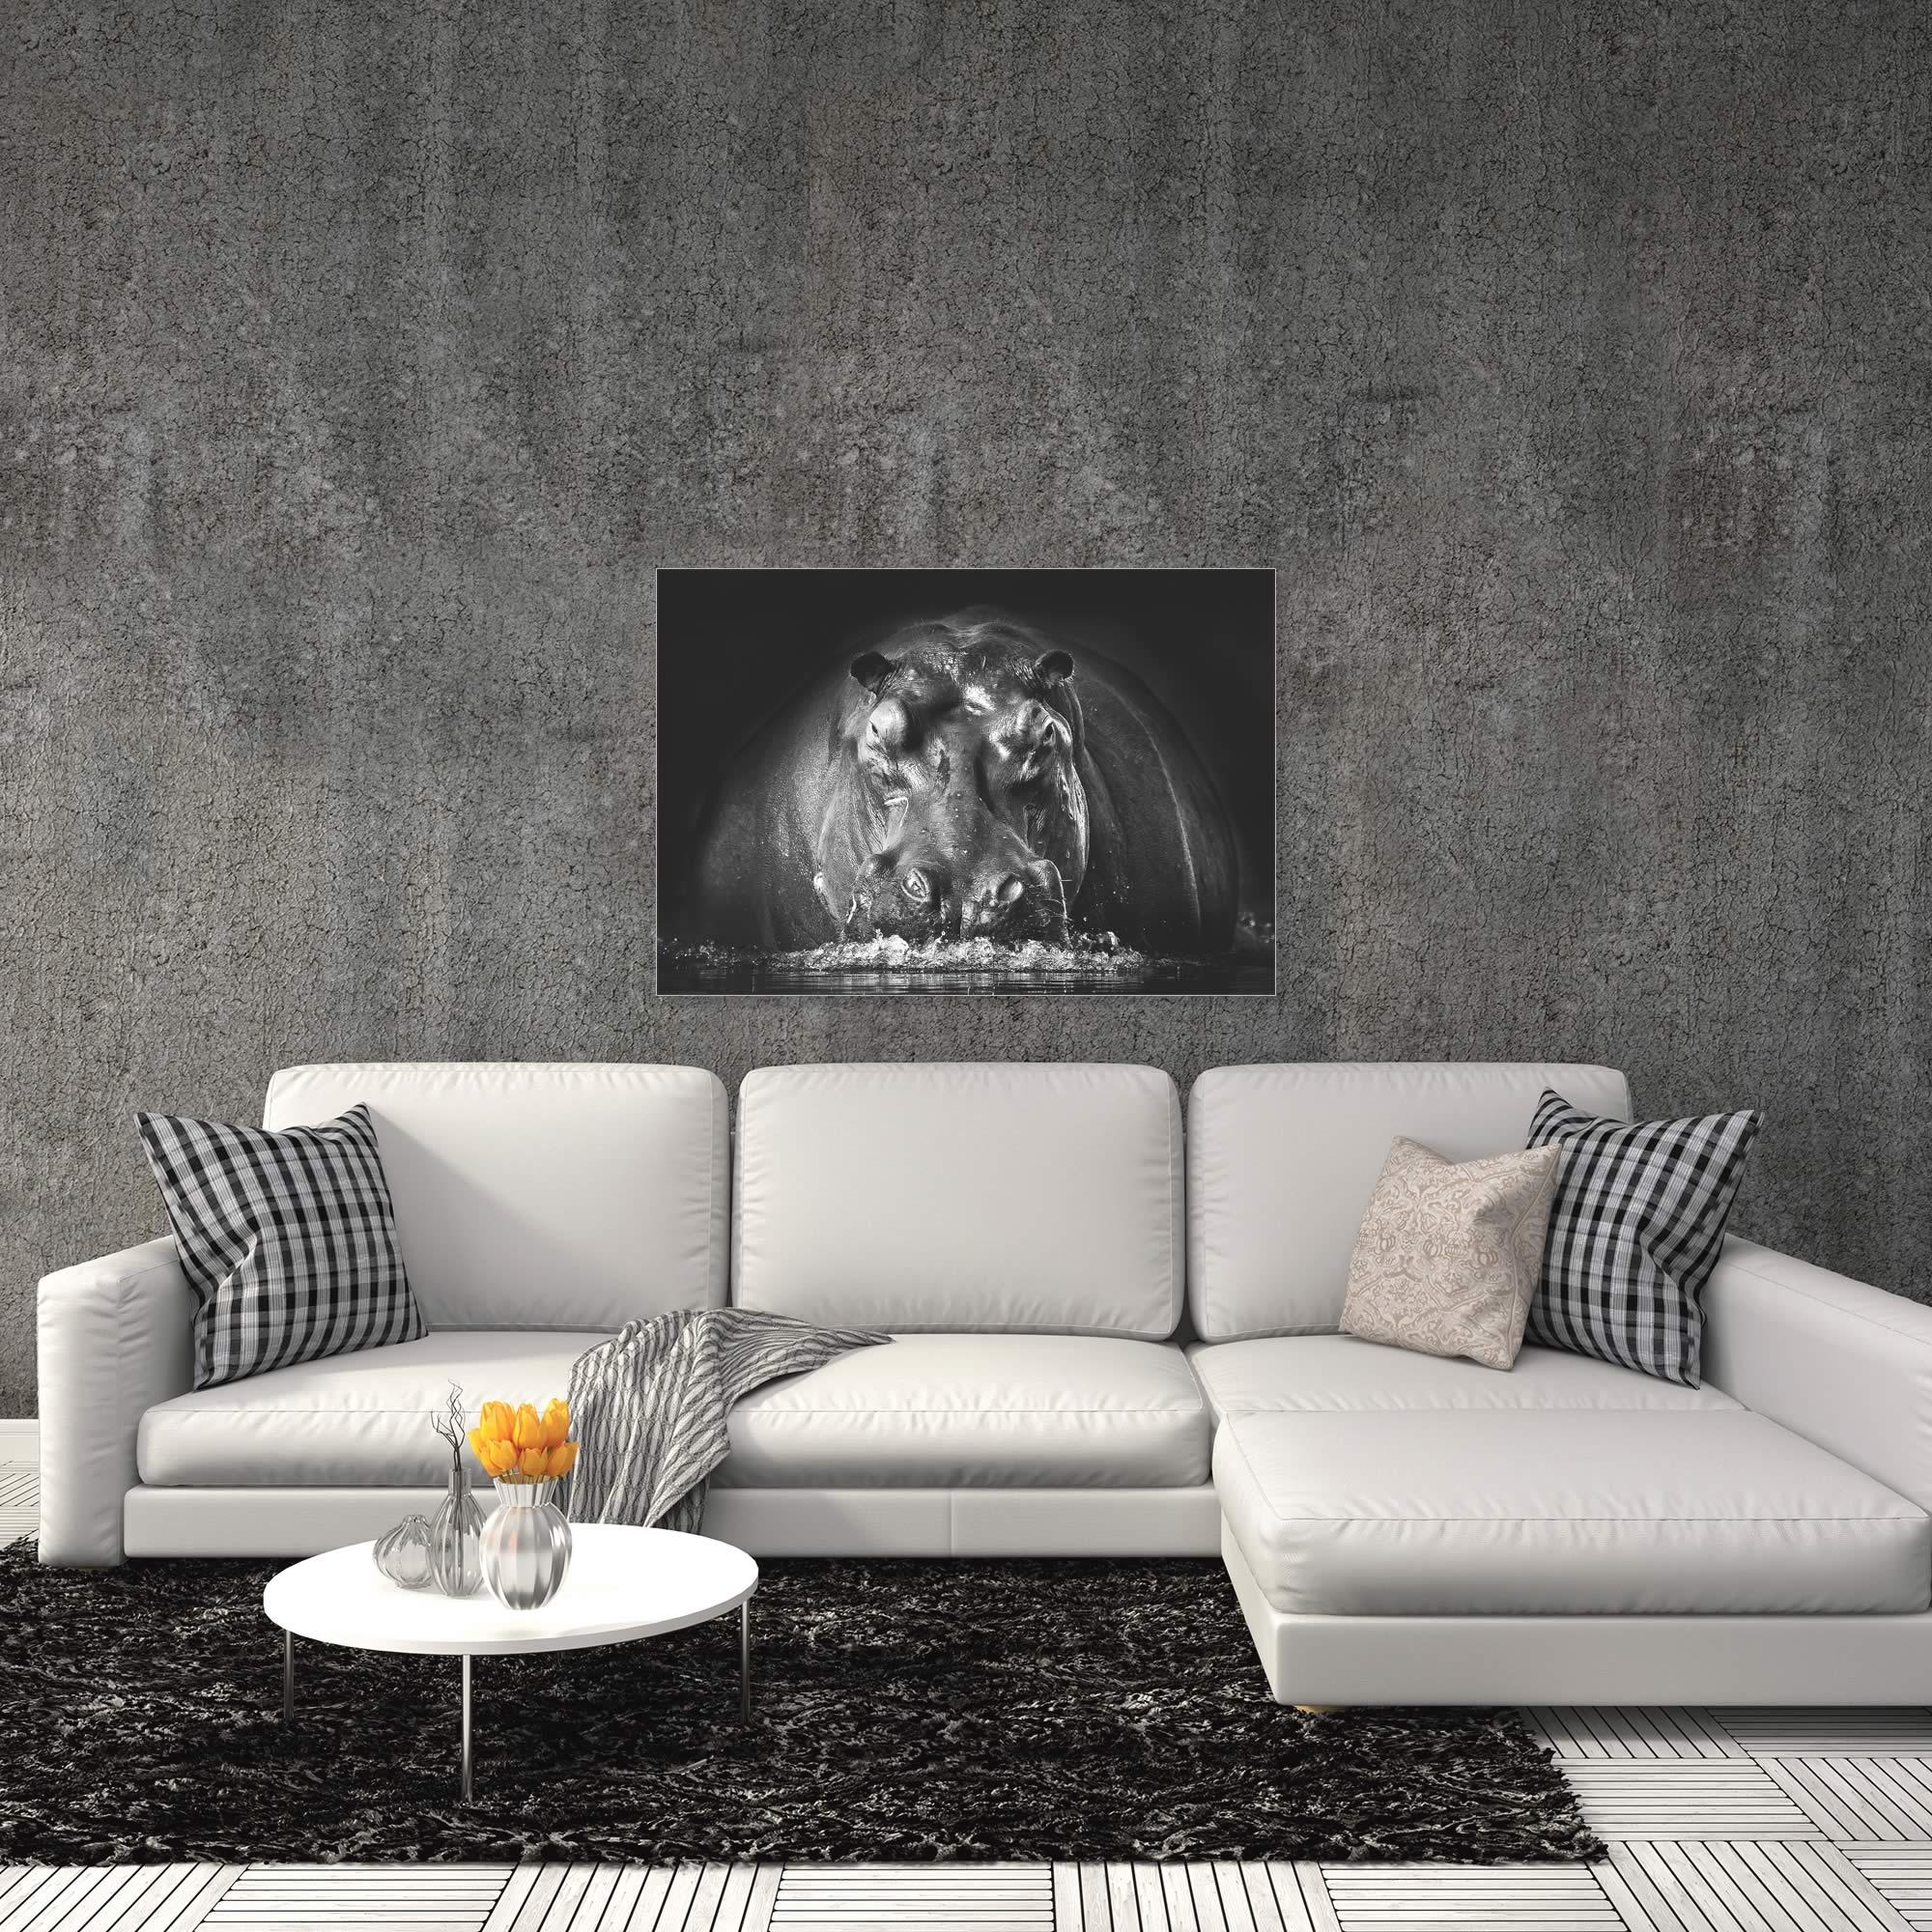 Hippo on Guard by Gorazd Golob - Modern Hippo Art on Metal or Acrylic - Alternate View 1